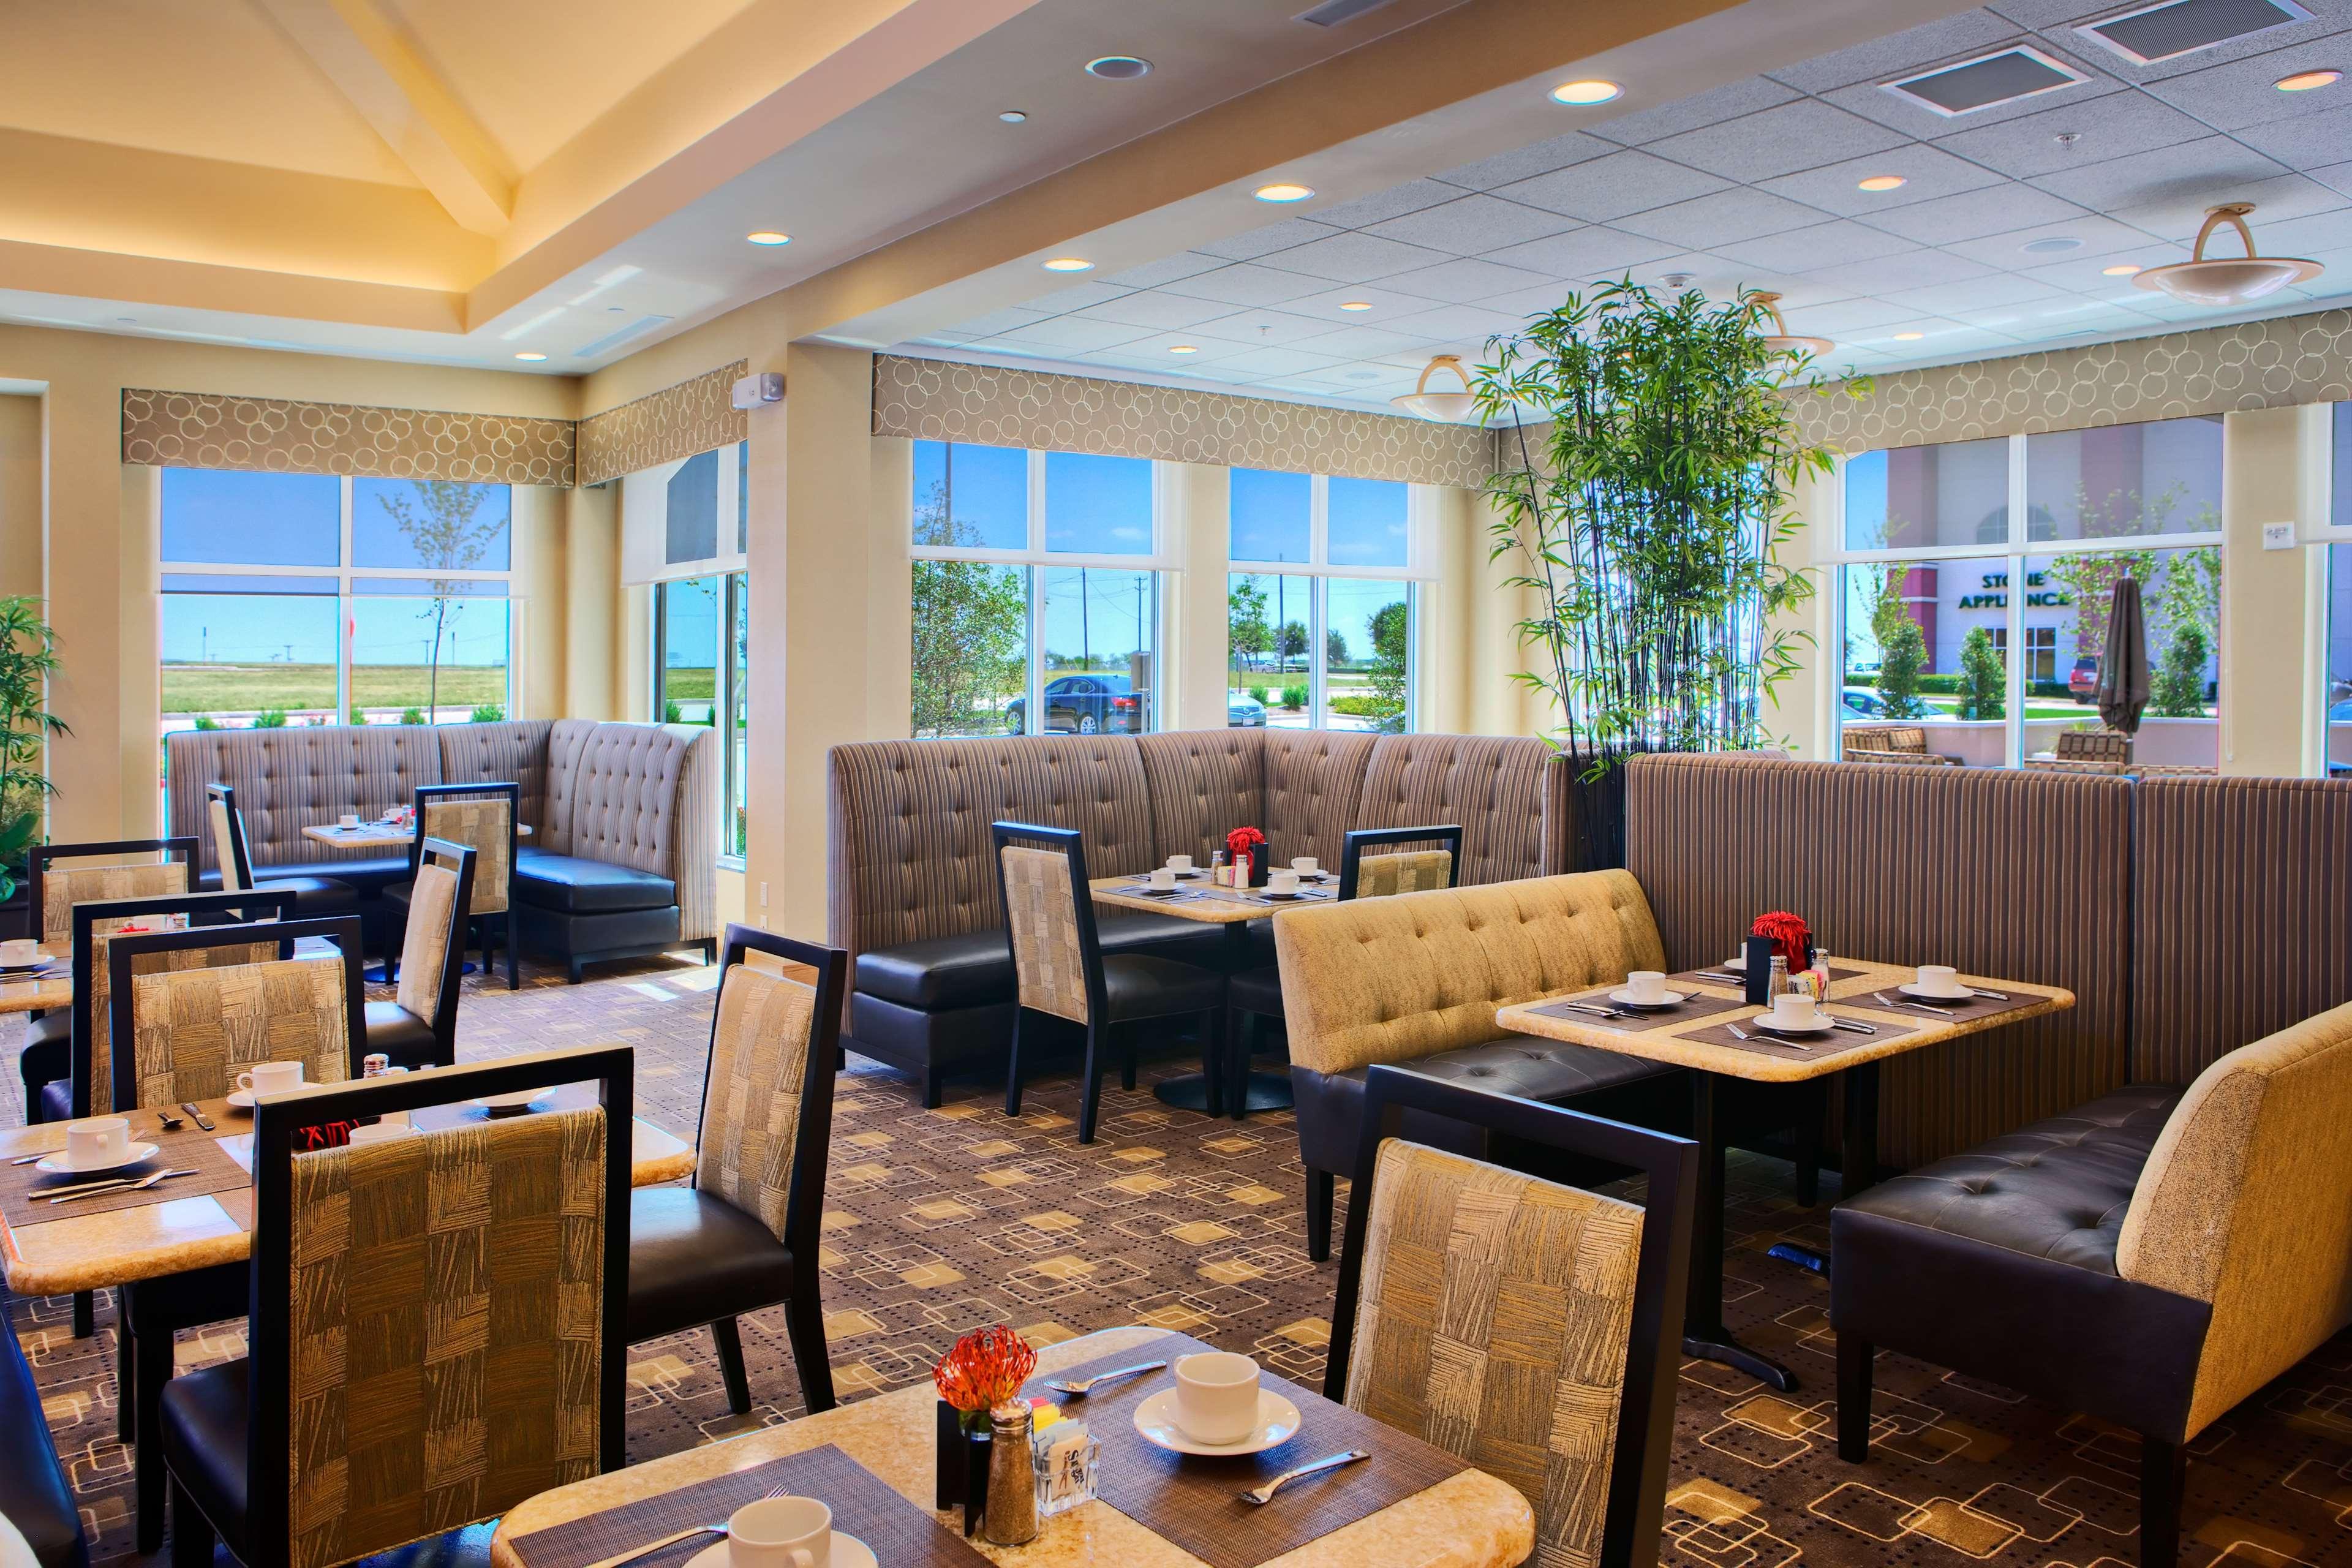 Hilton Garden Inn DFW North Grapevine image 11